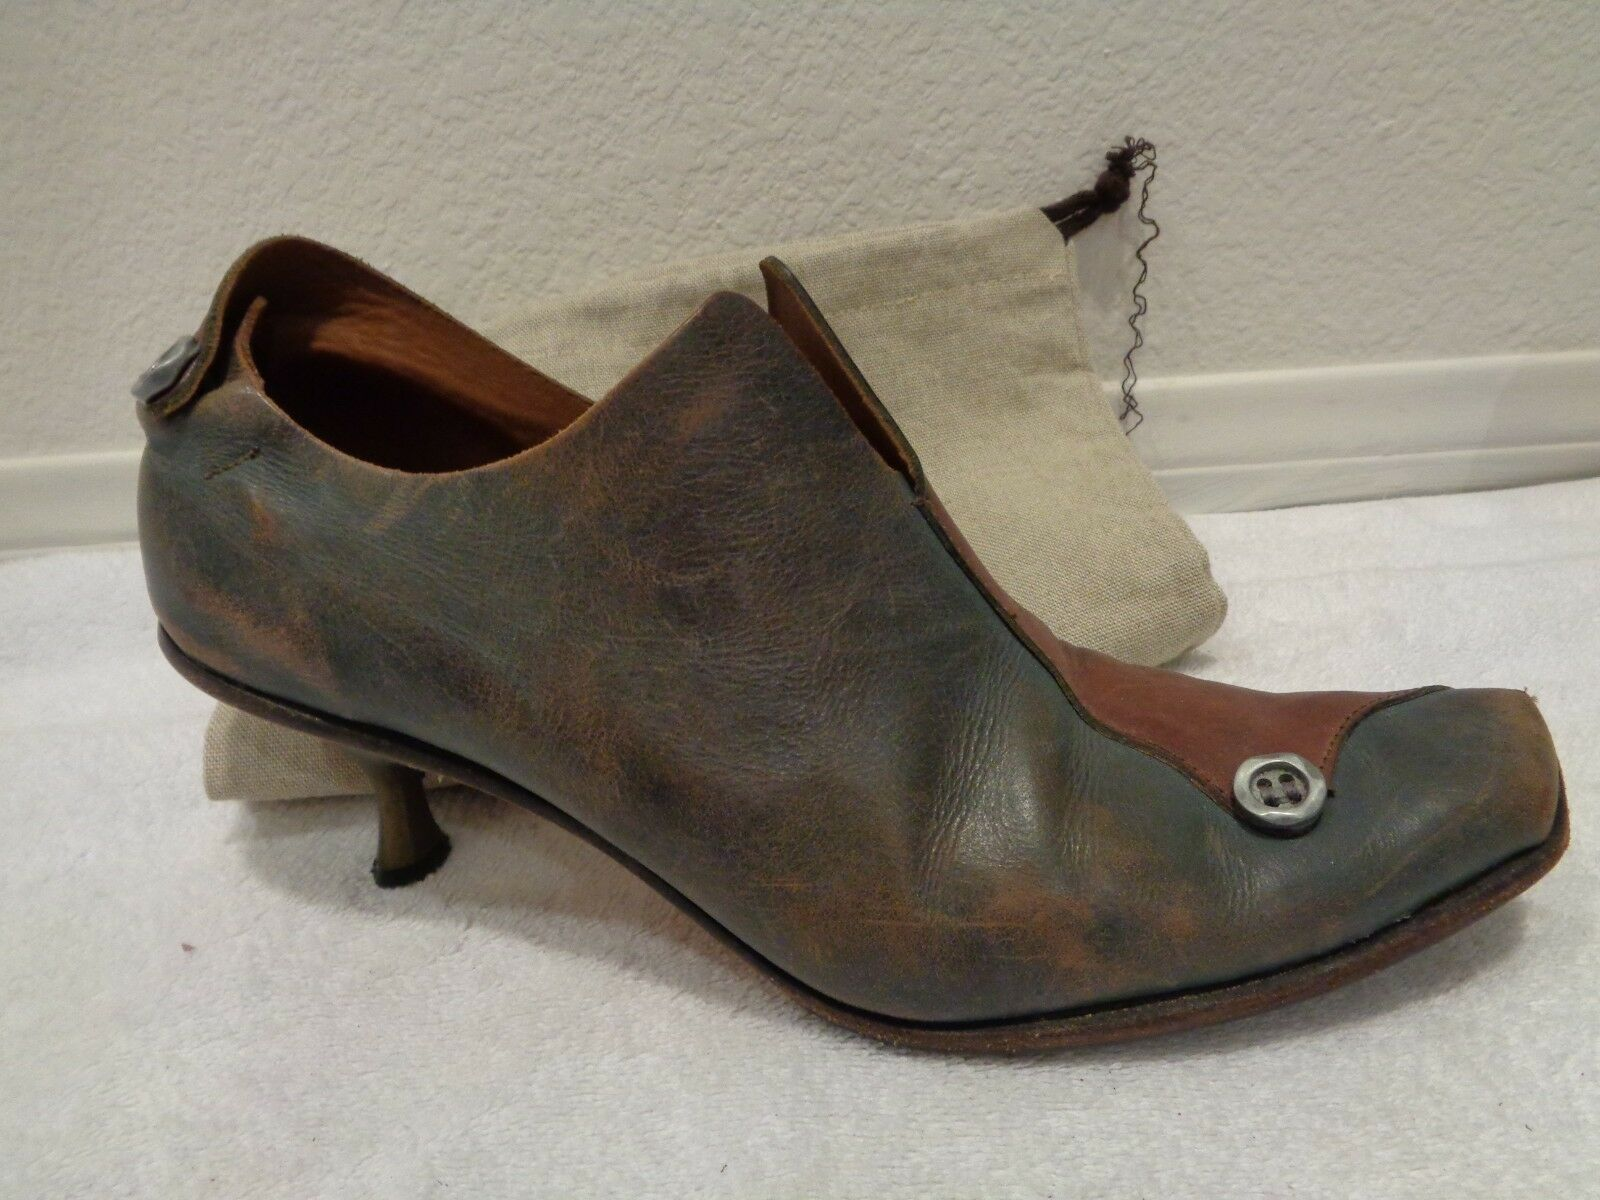 CYDWOQ multi multi multi color ankle shoe boots SZ 39.5 9.5 9 9b0ad0